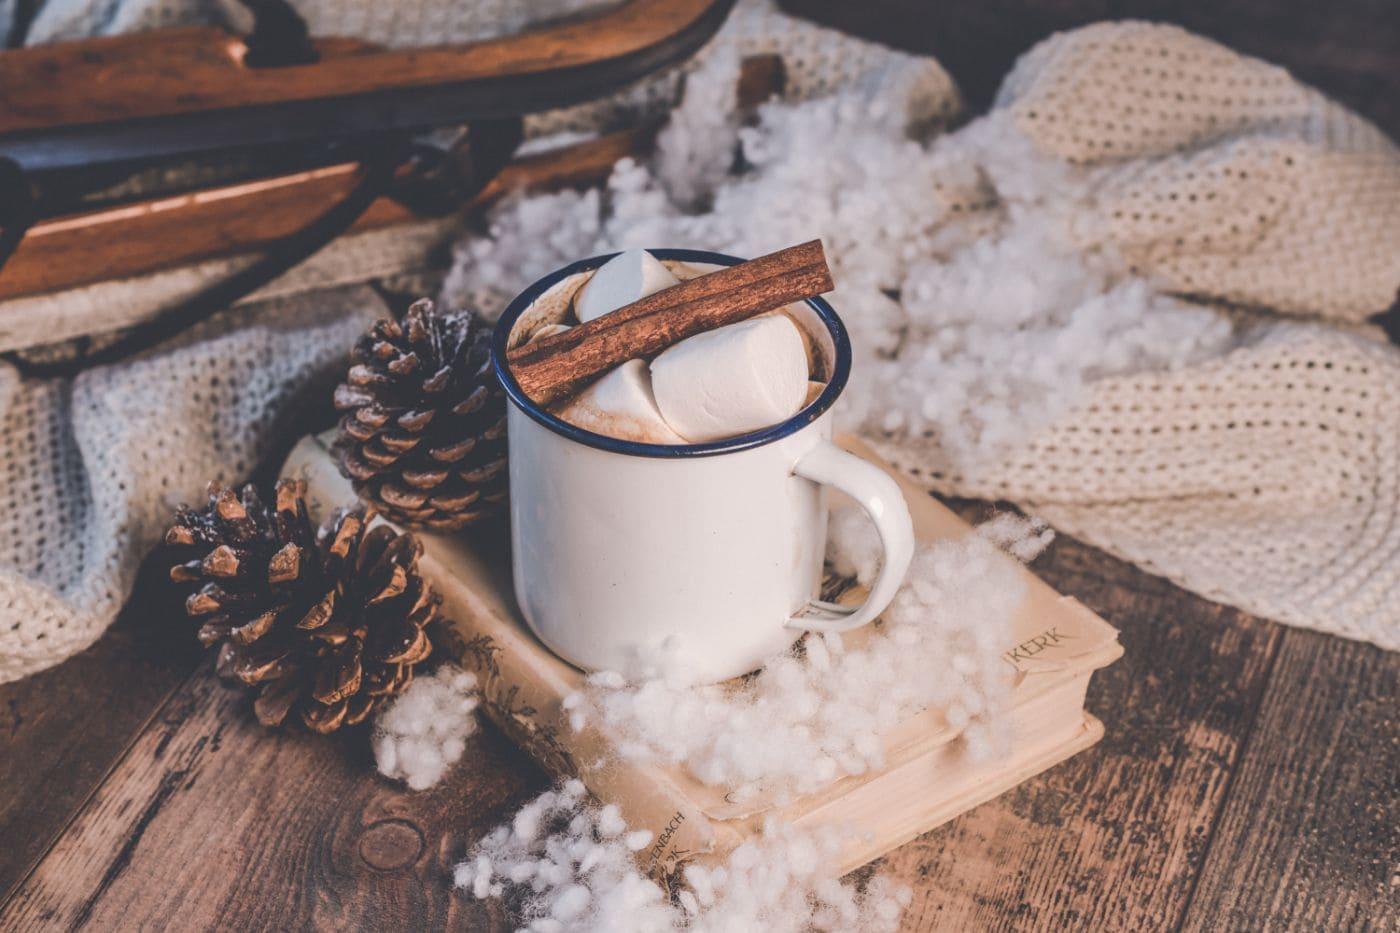 Ontspan met het Fitbox Relax kerstpakket